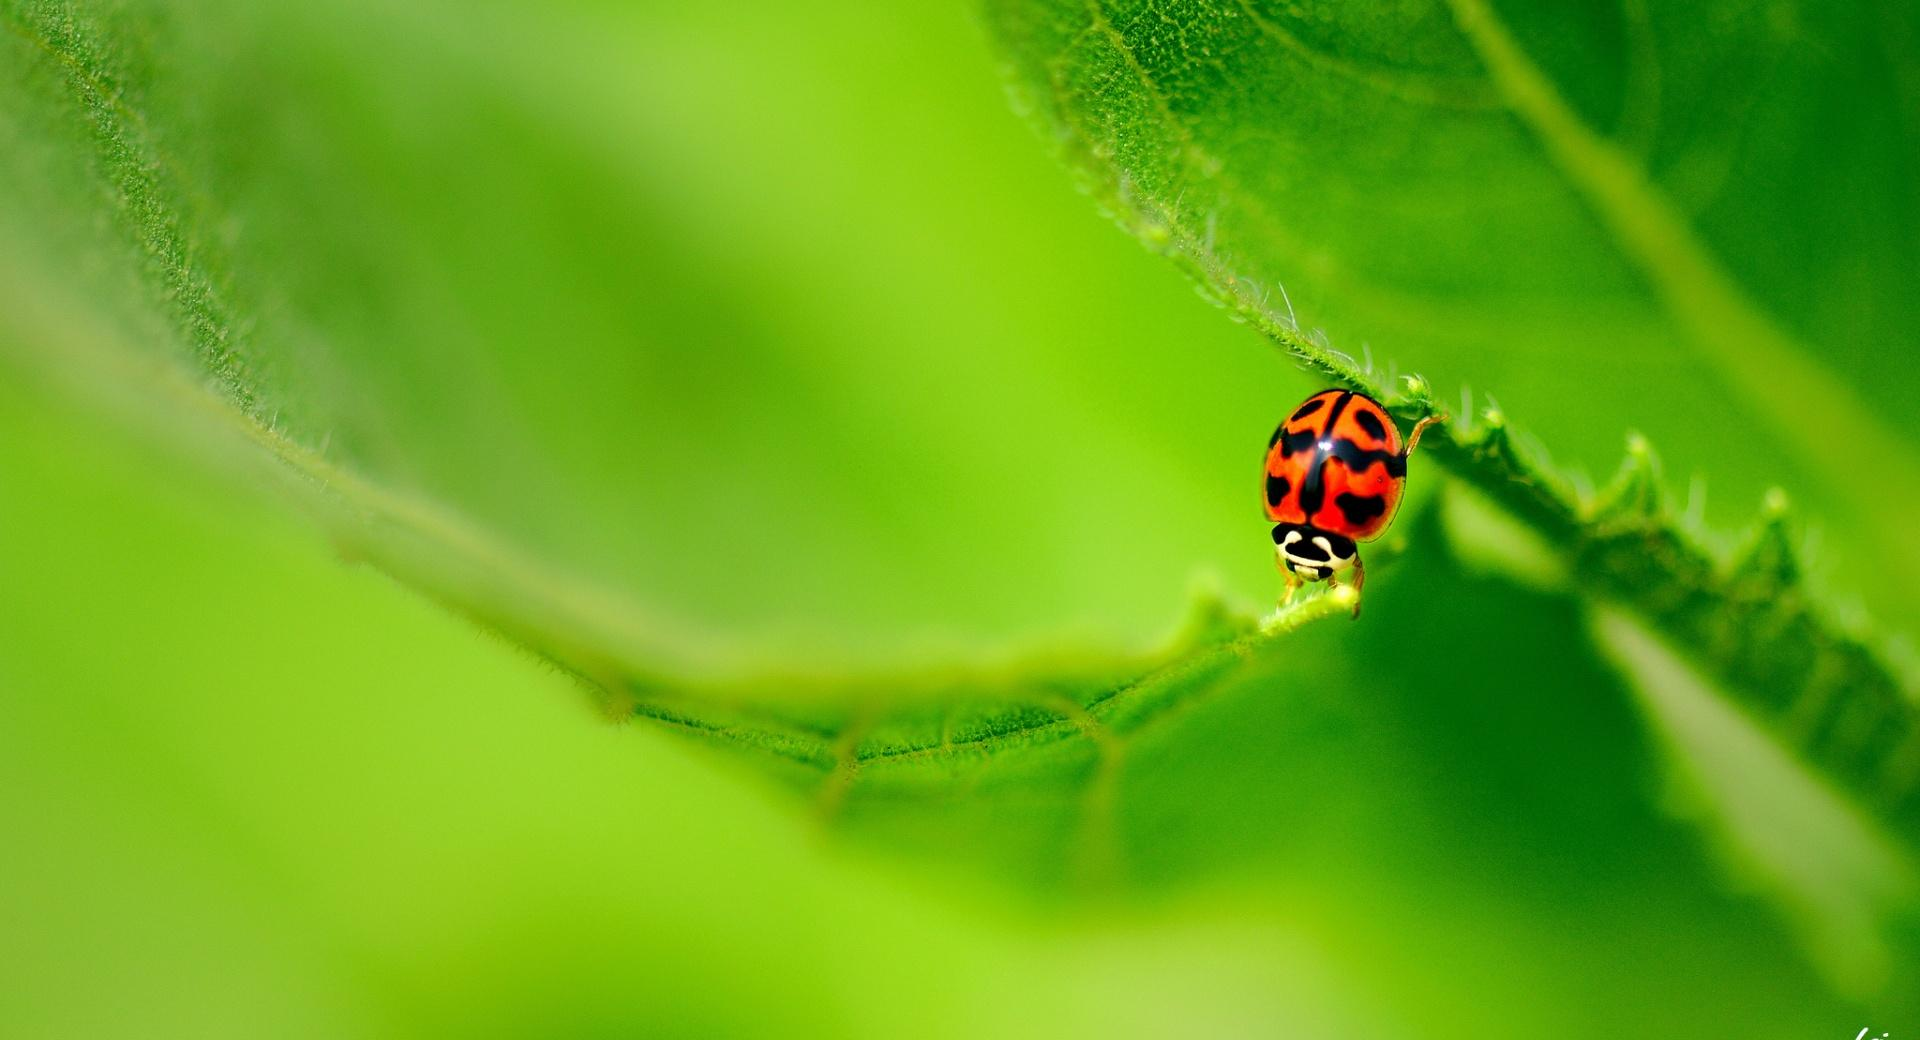 Ladybug On A Green Leaf wallpapers HD quality